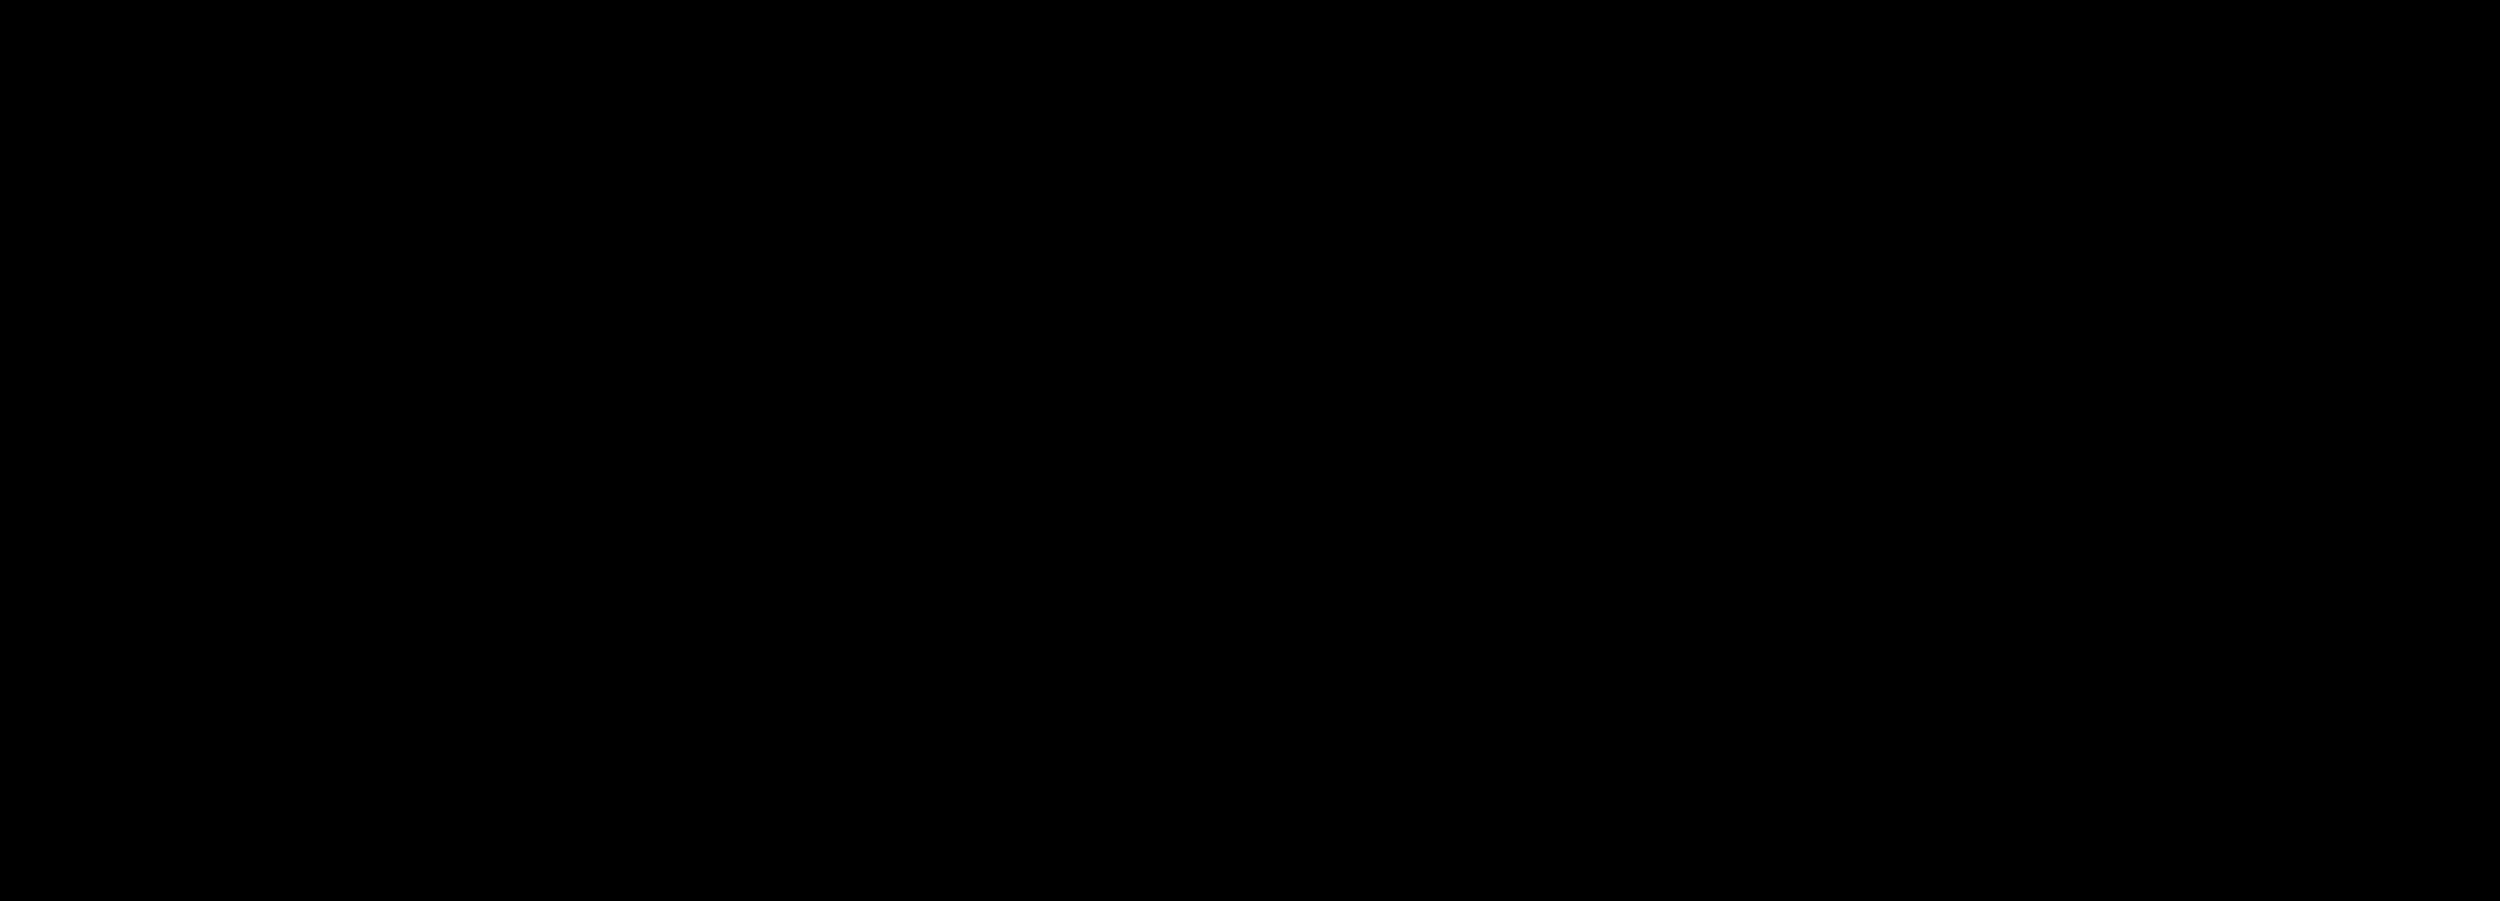 Wednesdays-Child-logo.png